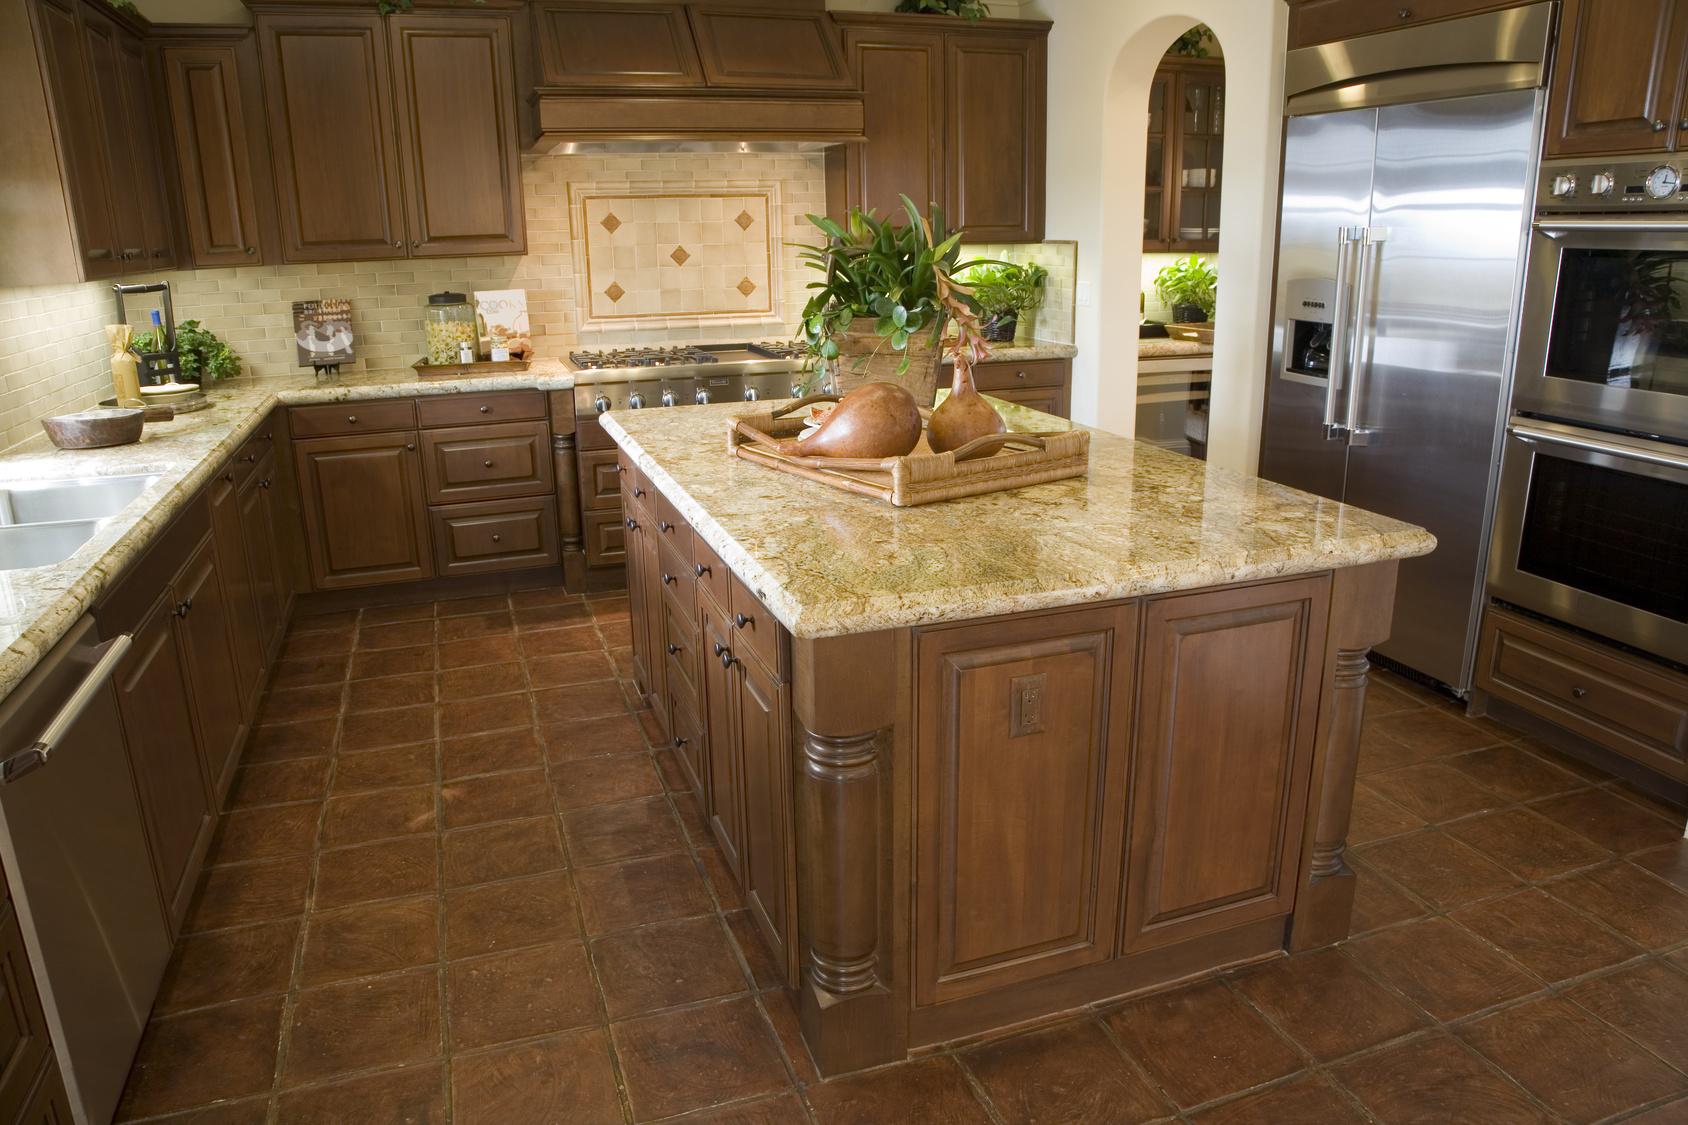 kitchen countertops las vegas strainer comfort home appliance in nv 89122